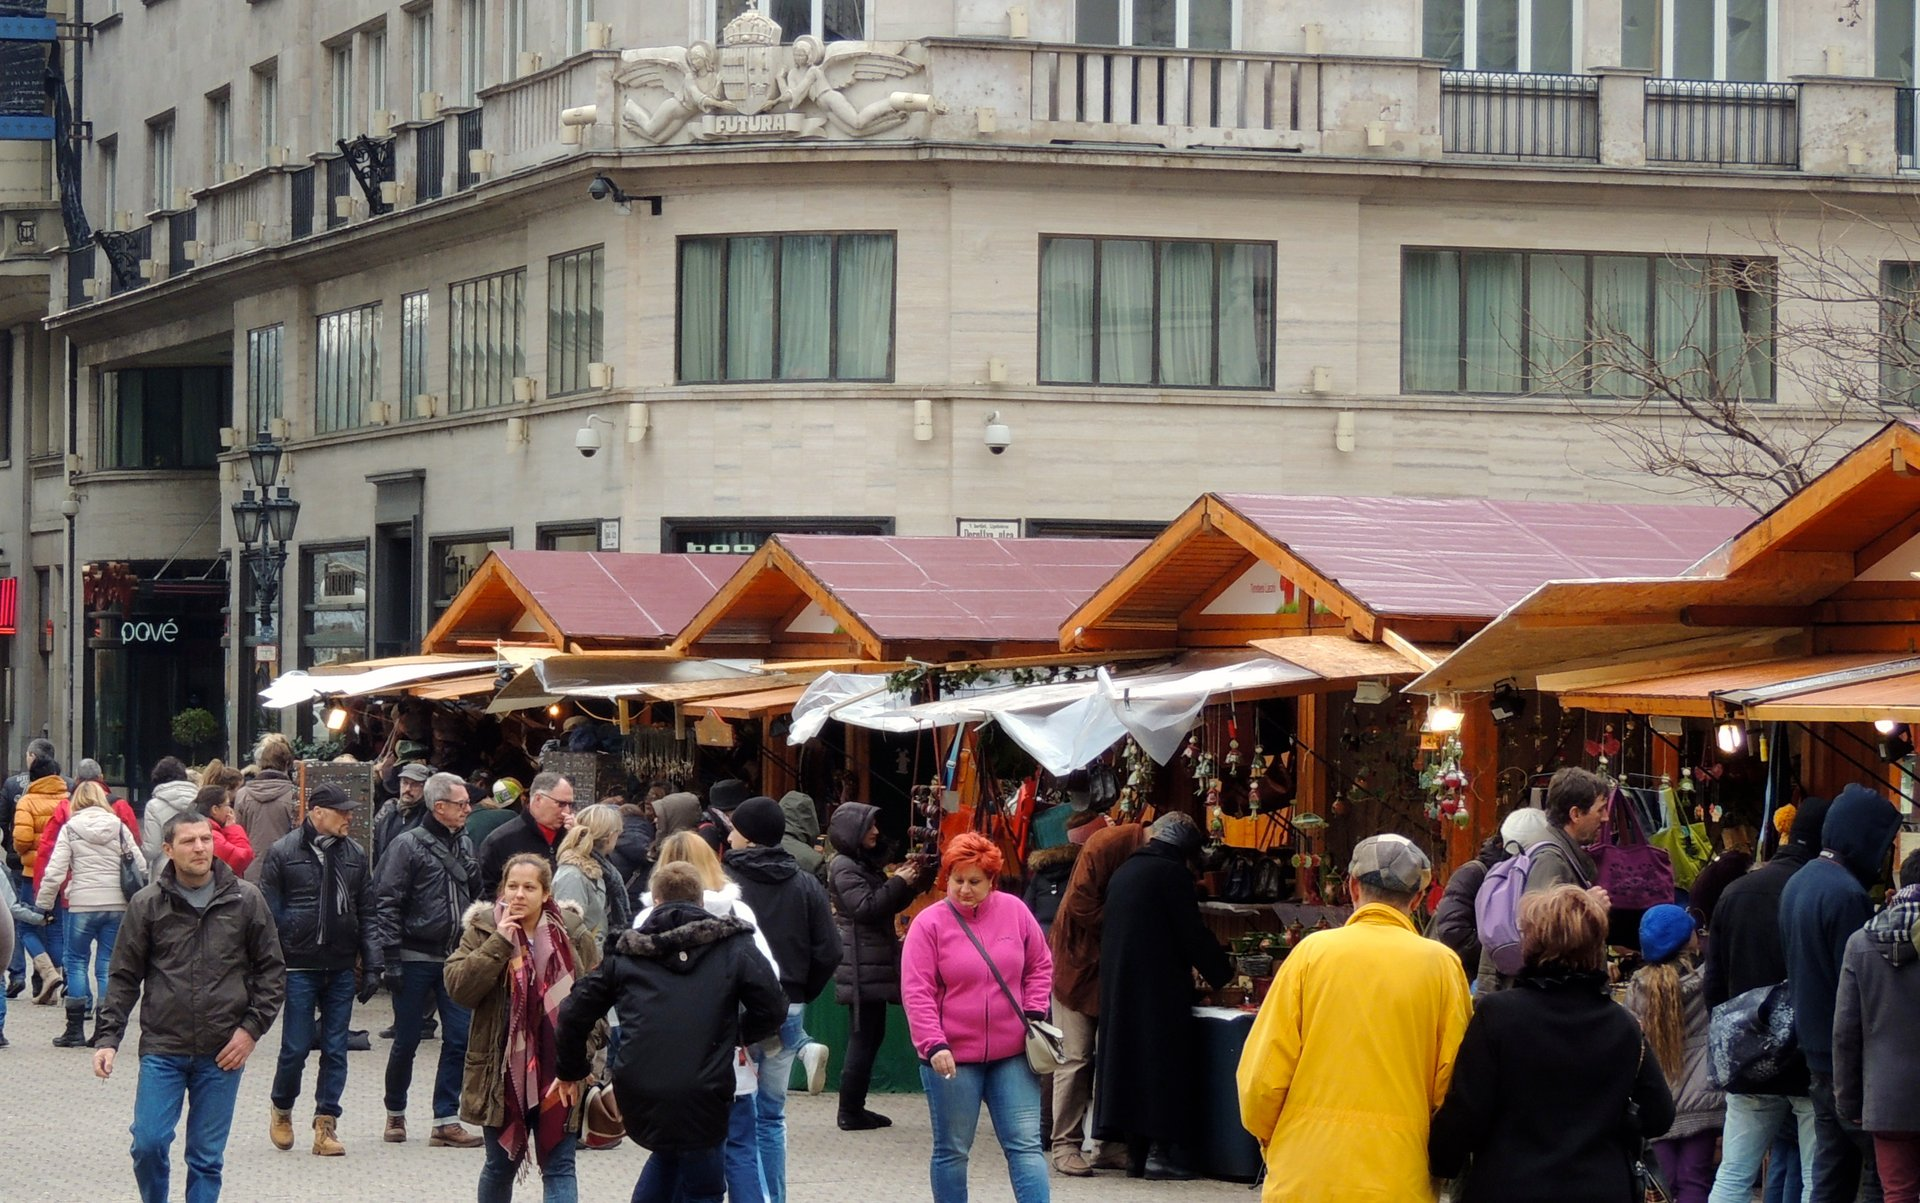 Budapest Easter Market at Vörösmarty Square 2020